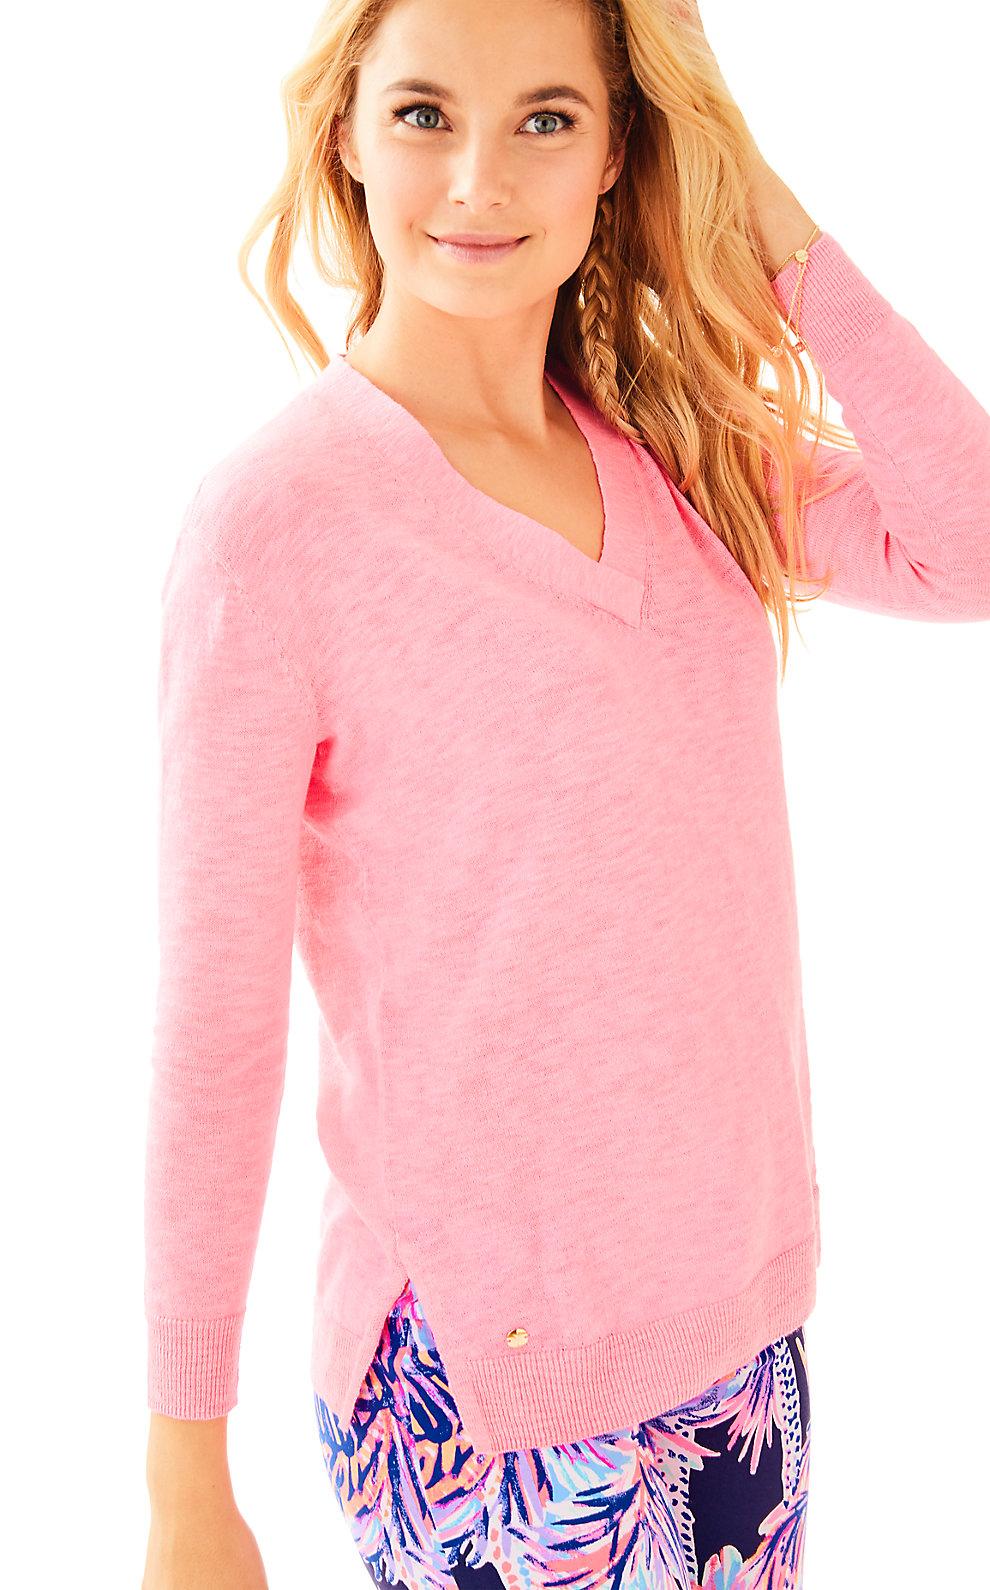 Lilly Pulitzer Blaine Tunic Sweater